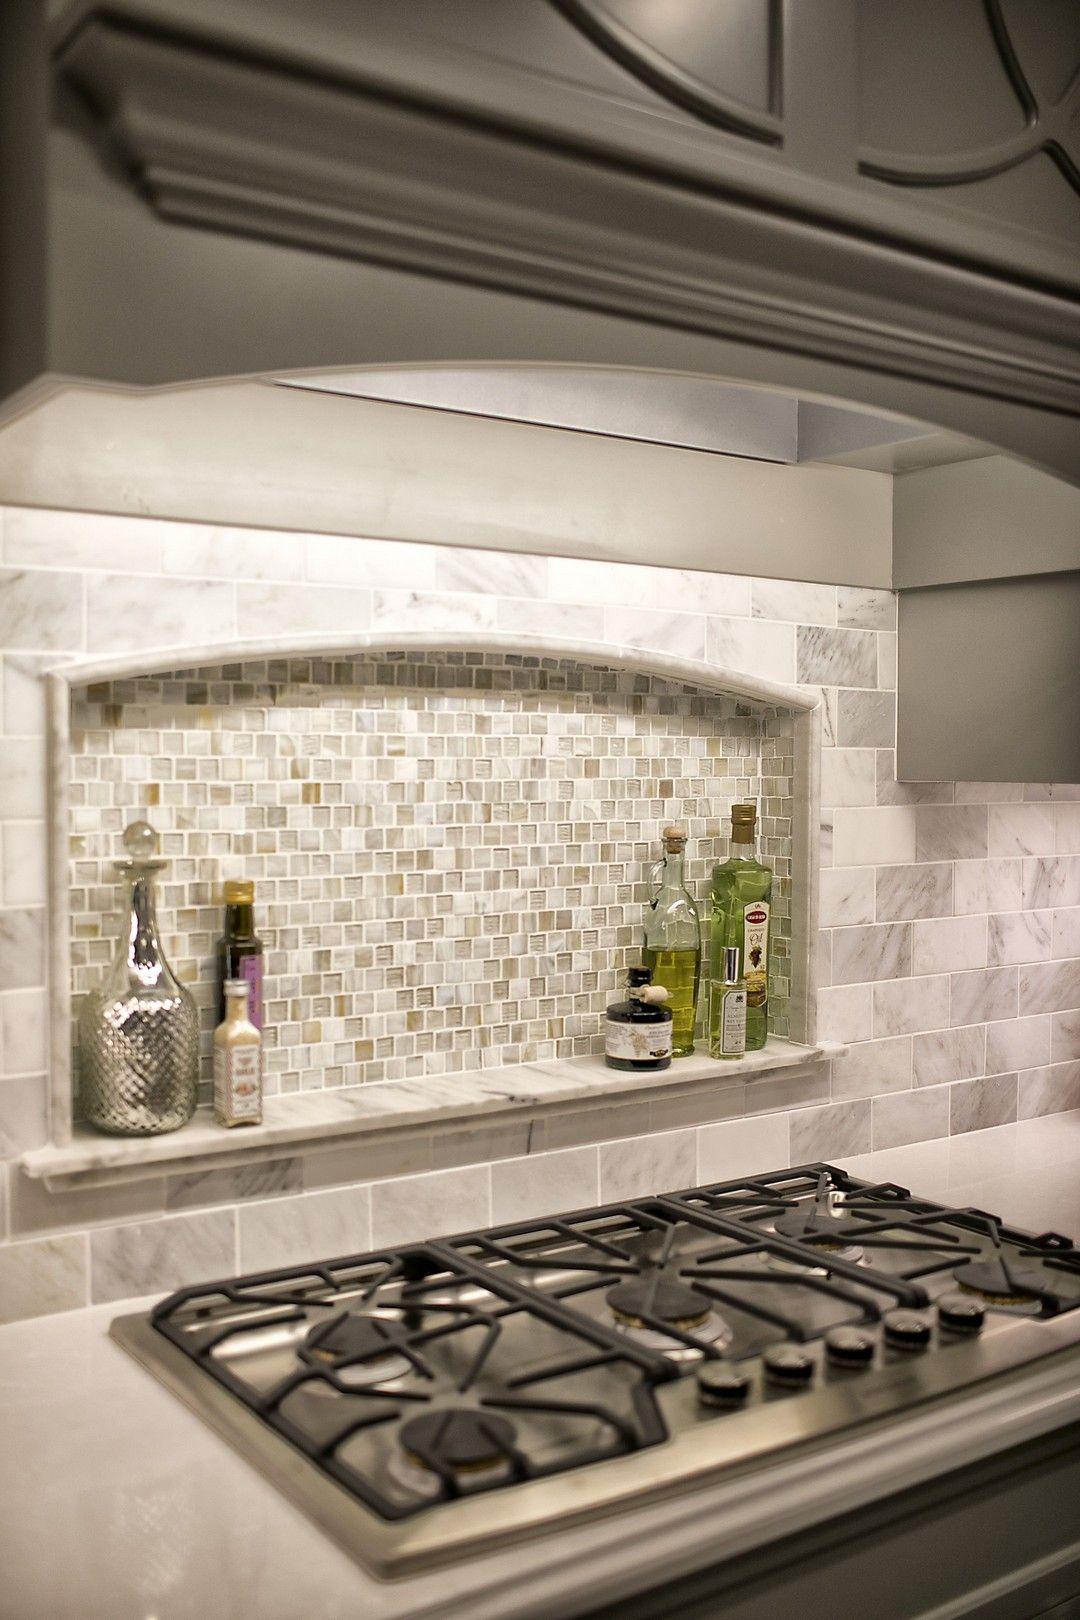 29 cool cheap diy kitchen backsplash ideas kitchen backsplash rh pinterest com